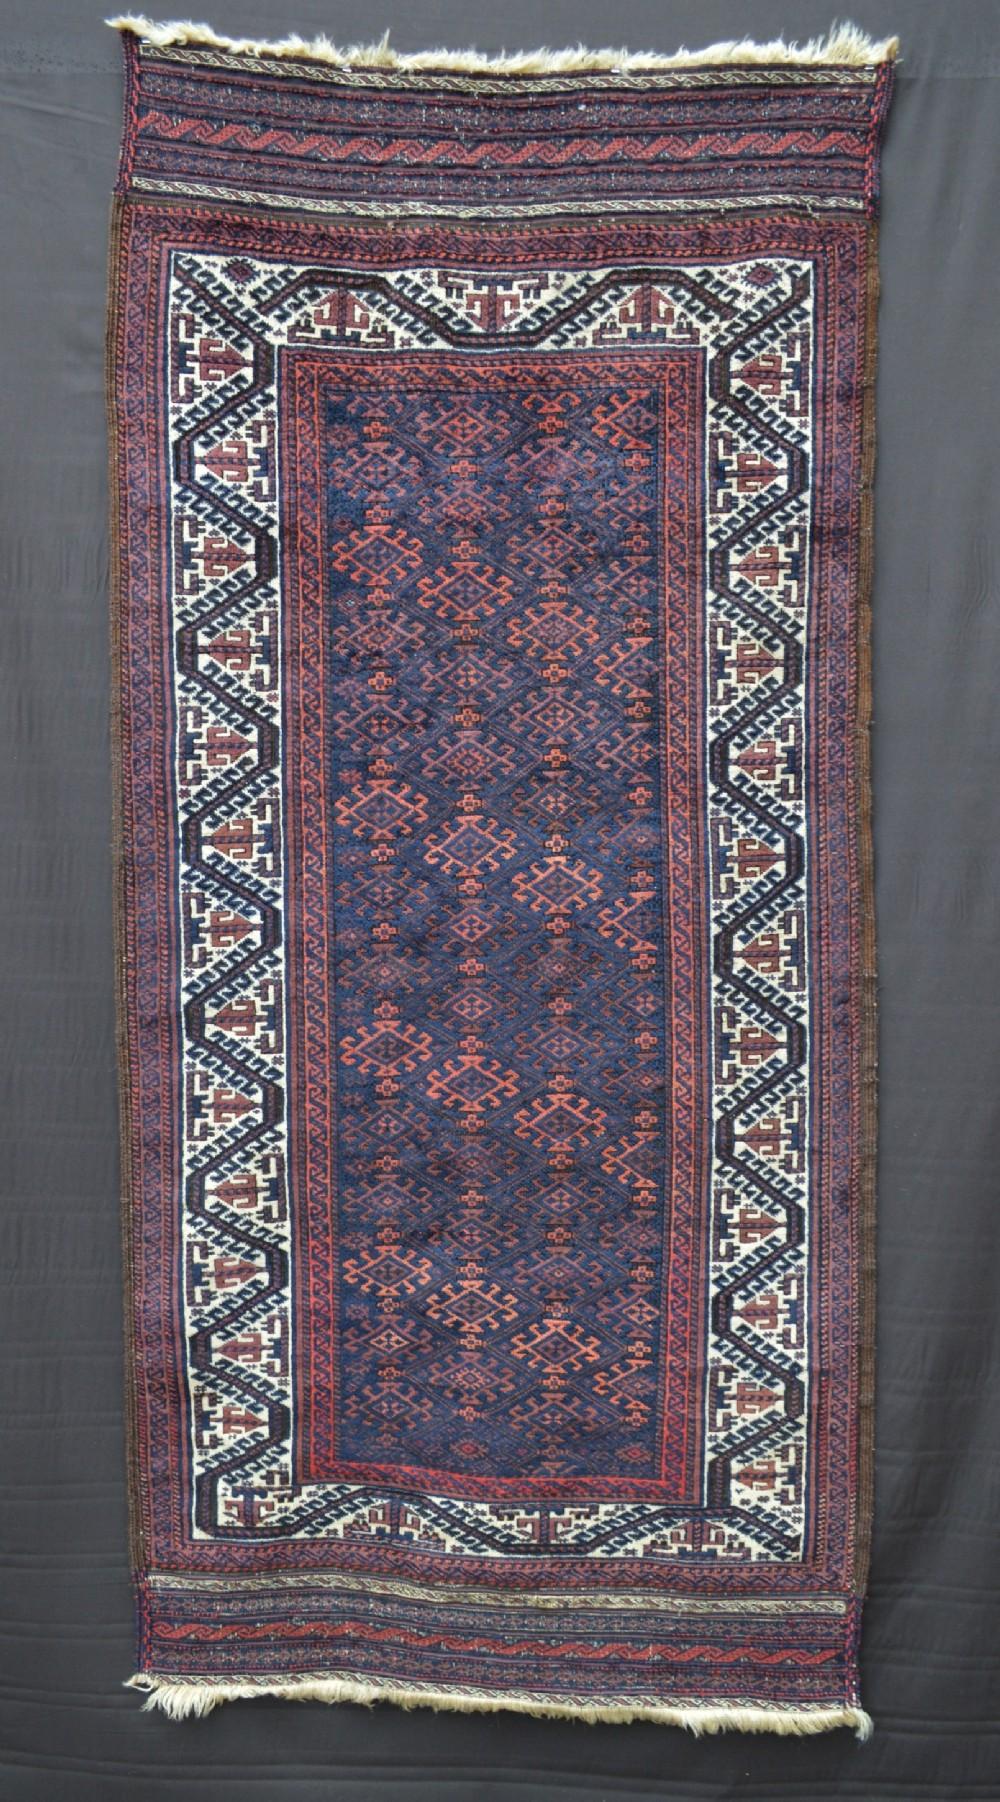 antique timuri tribal rug borderlands of eastern persiawestern afghanistan